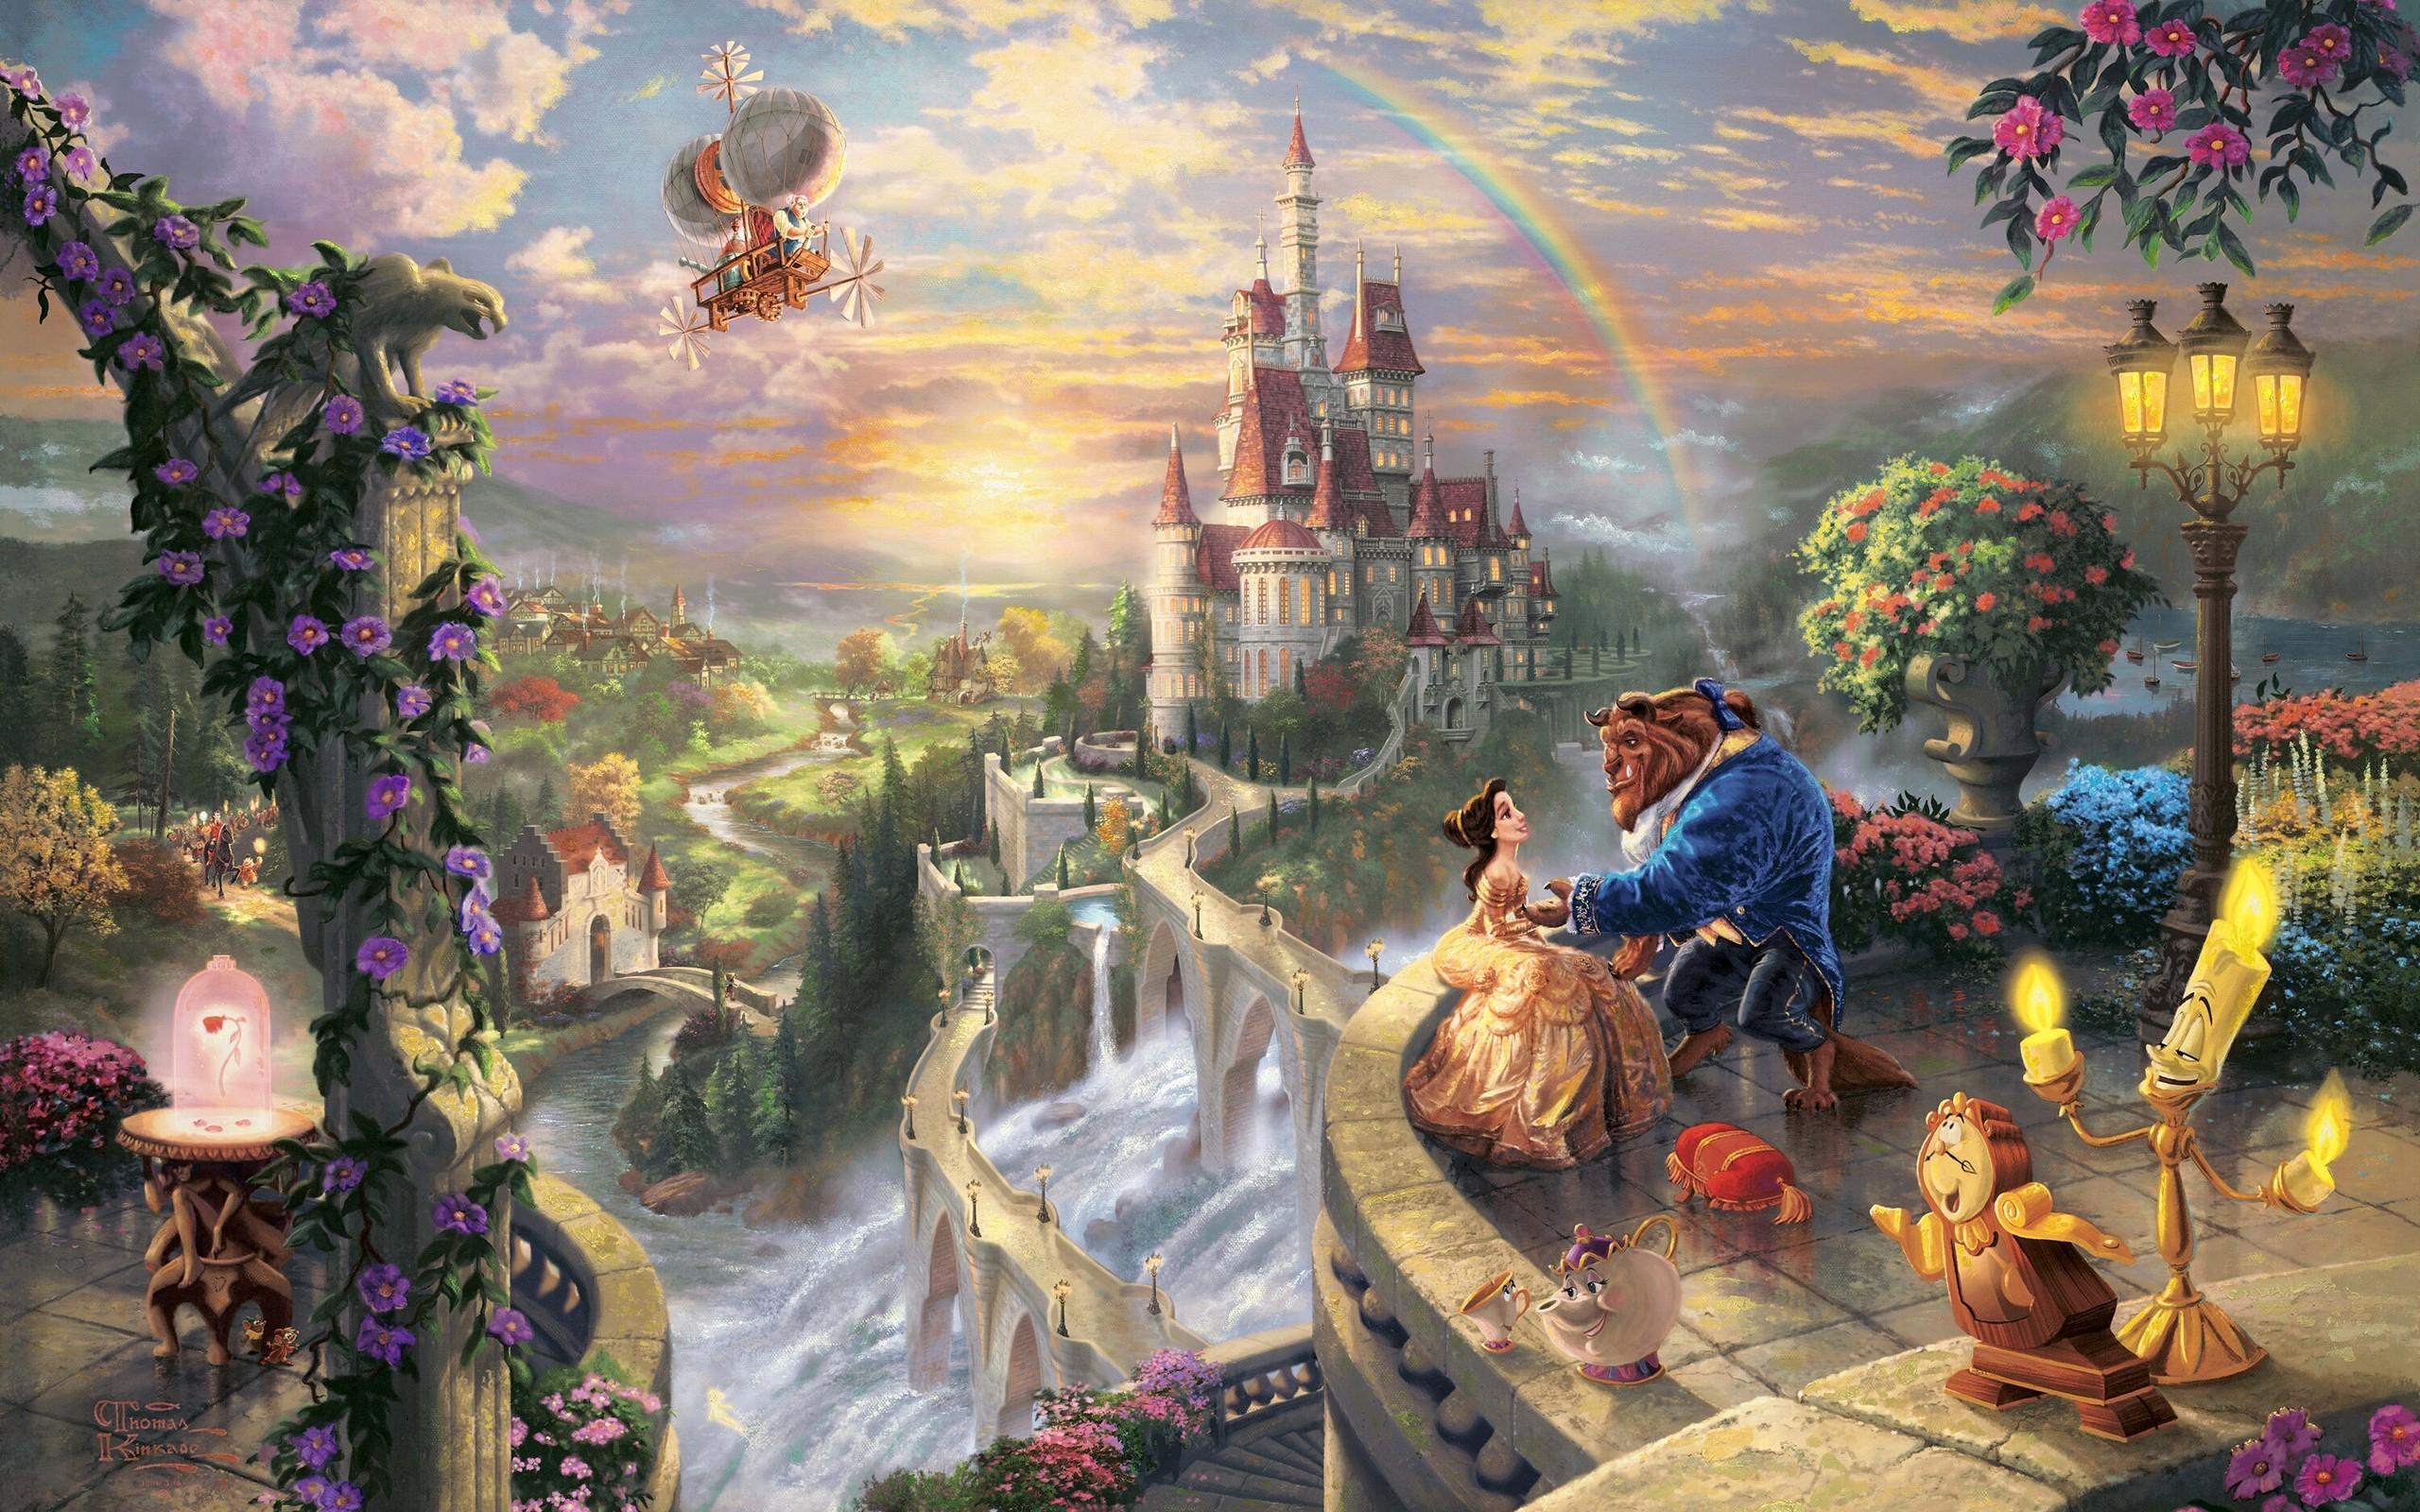 thomas kinkade waterfalls fairy tales beauty and the beast wallpaper .